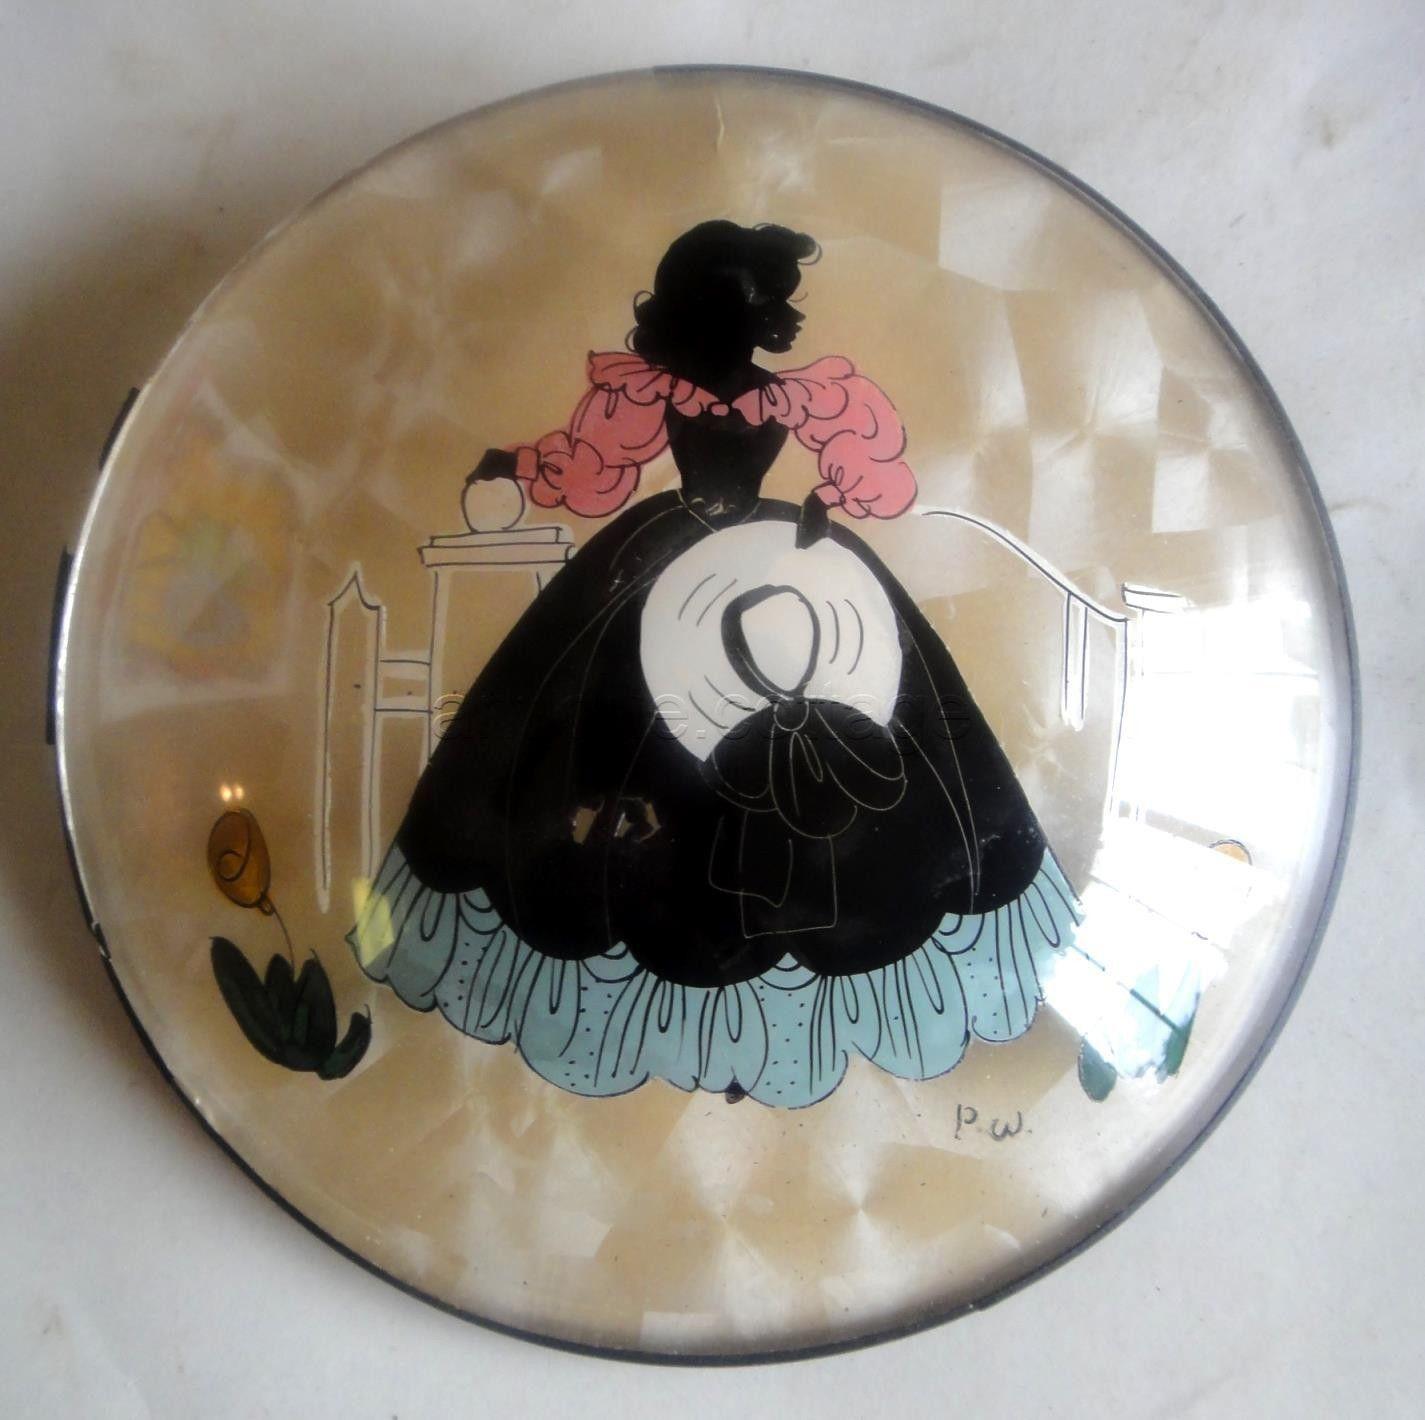 Pin de Mama Mia en Crinoline Fashion -- Southern Belle | Pinterest